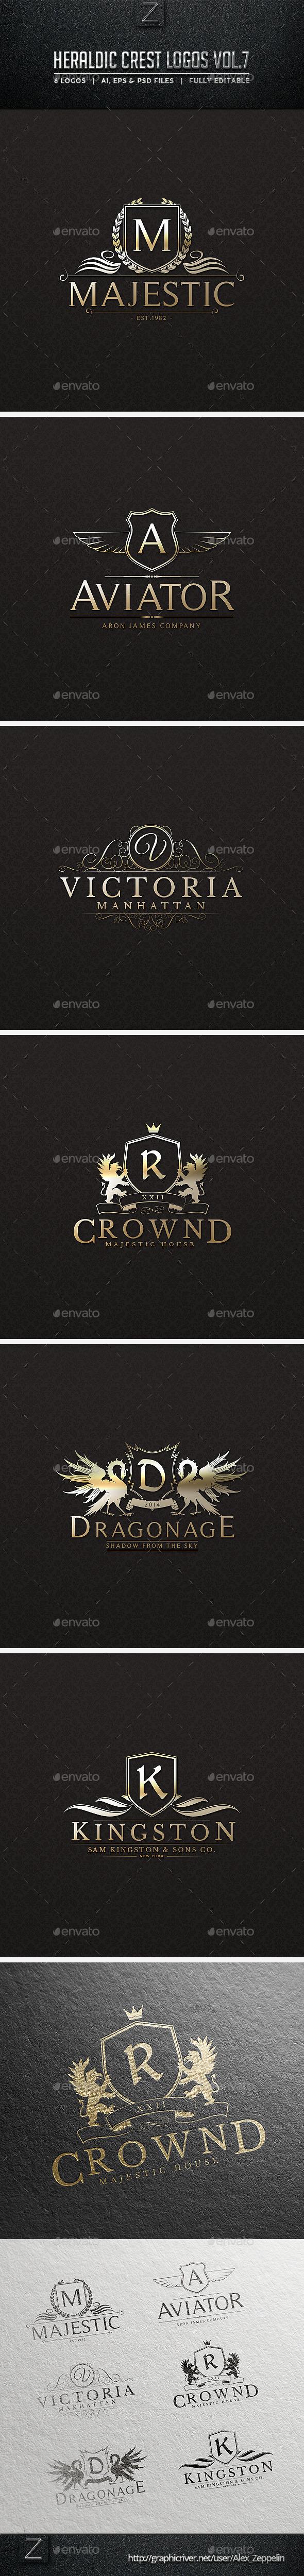 Heraldic Crest Logos Vol.7 - Badges & Stickers Web Elements